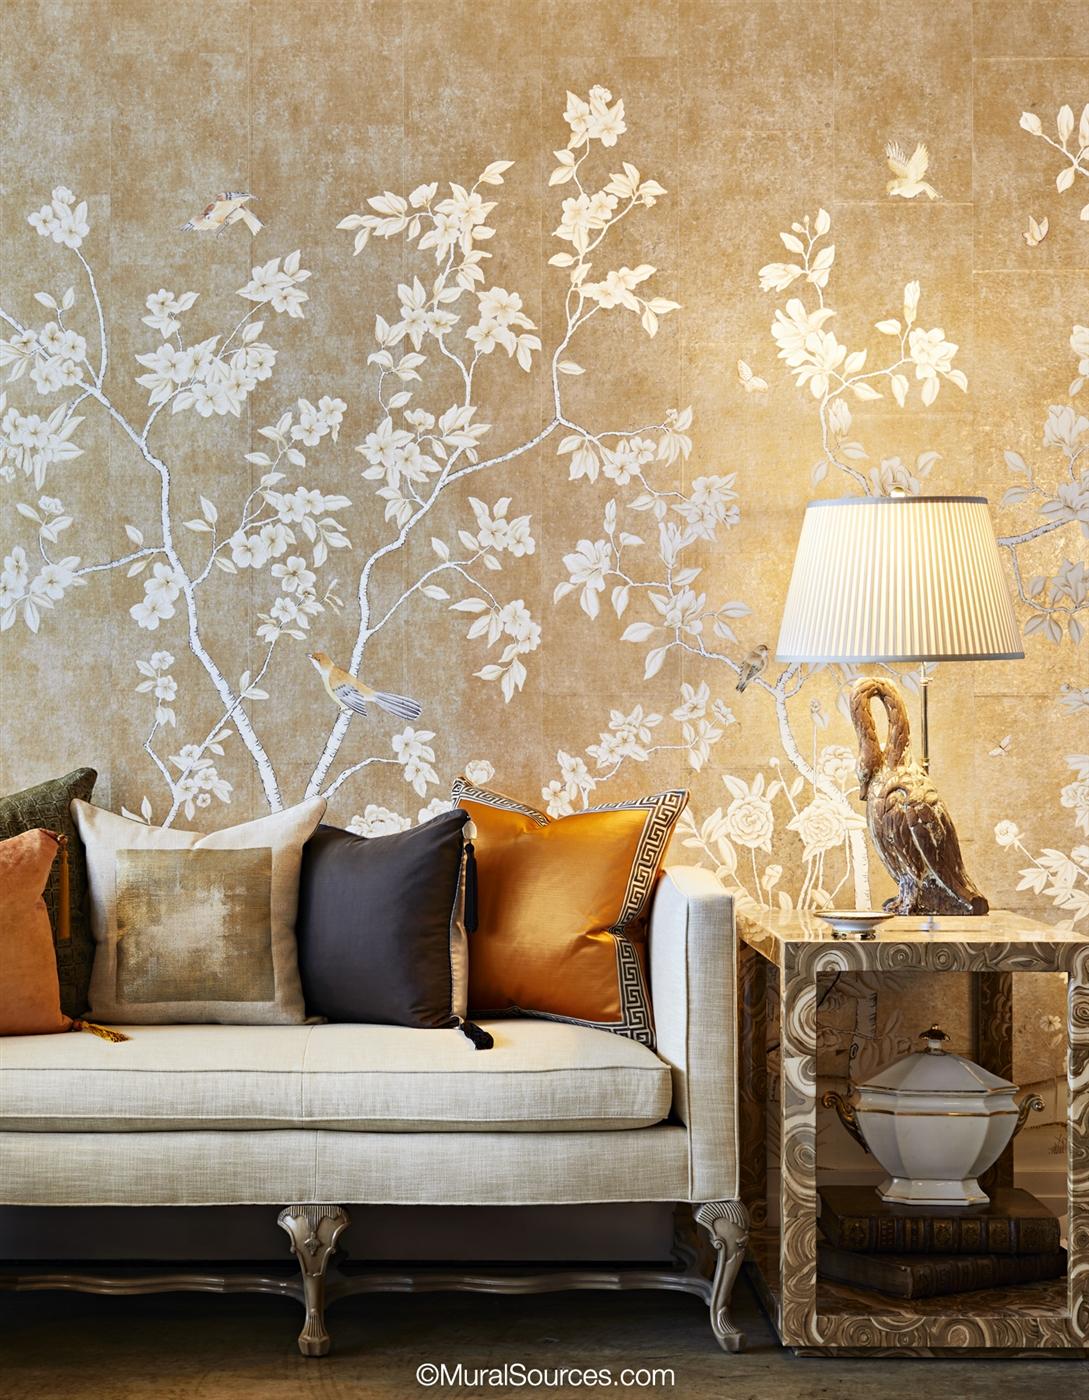 Carolina Silver Speckle Chinoiserie Mural Wallpaper